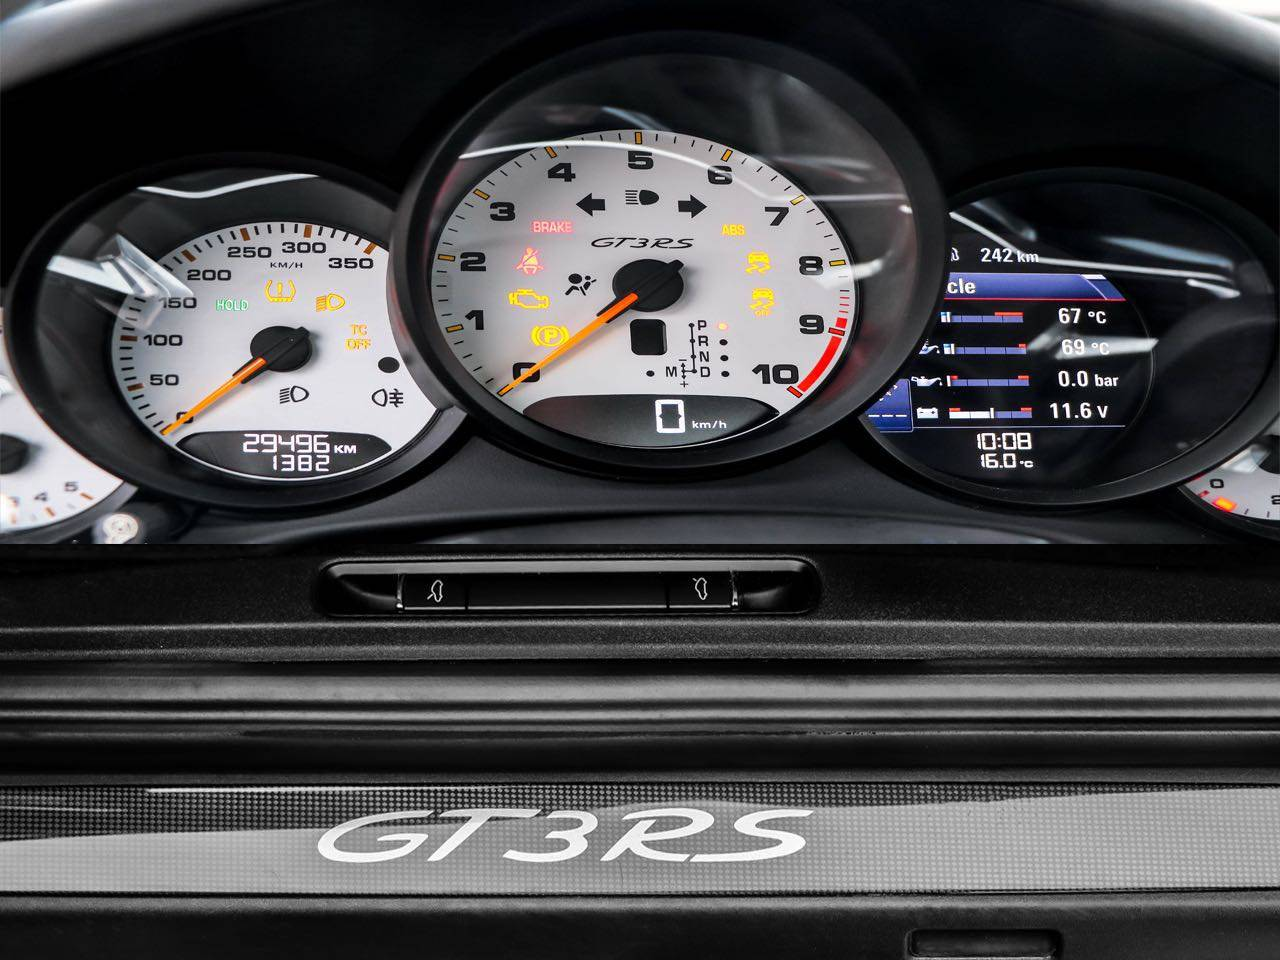 Porsche-991-Coupè-991-PDK-GT3-RS-Martini-14